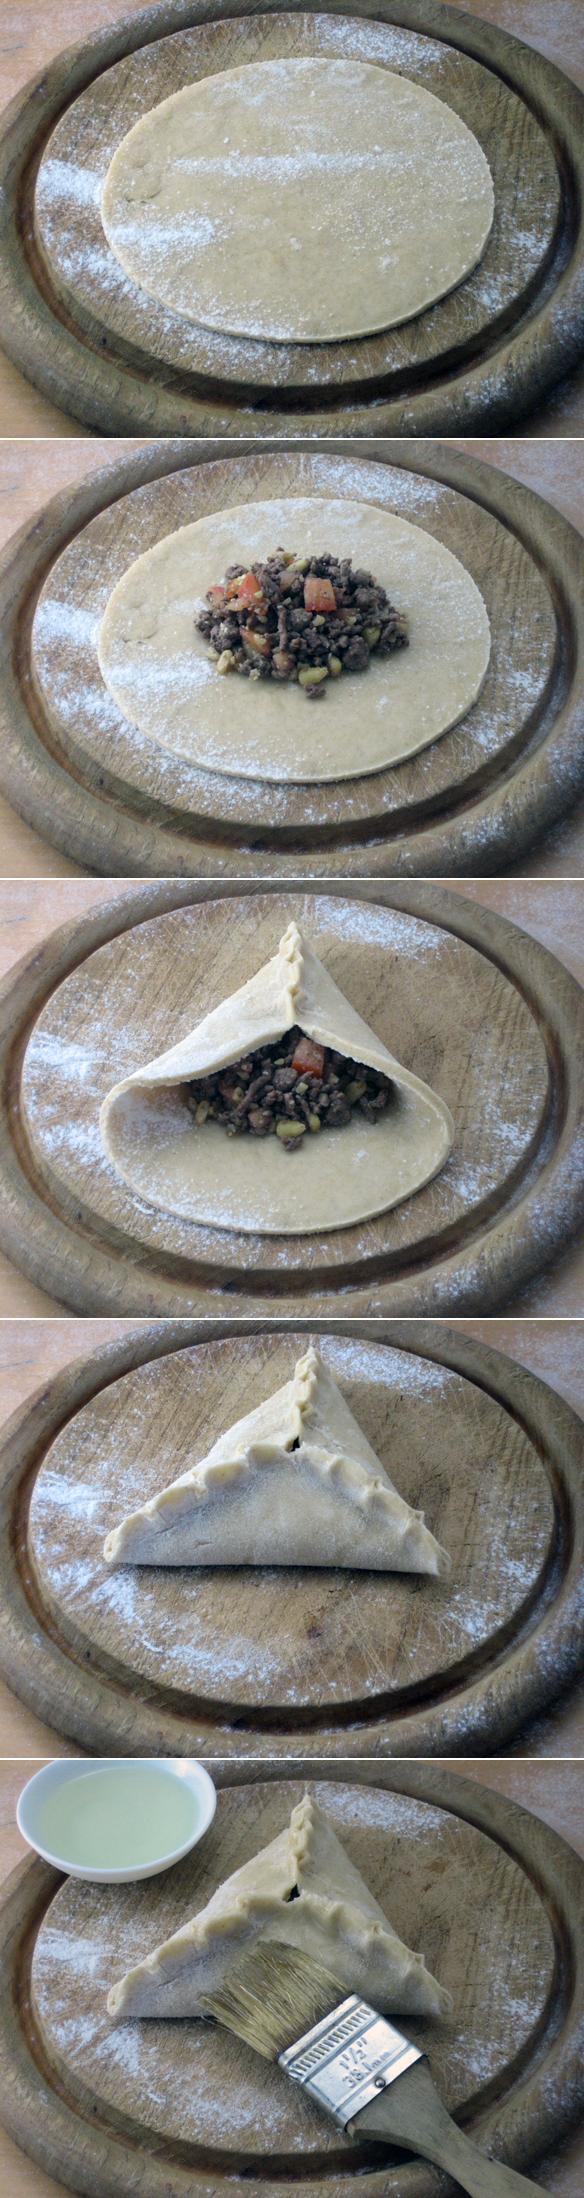 Folding sambousek